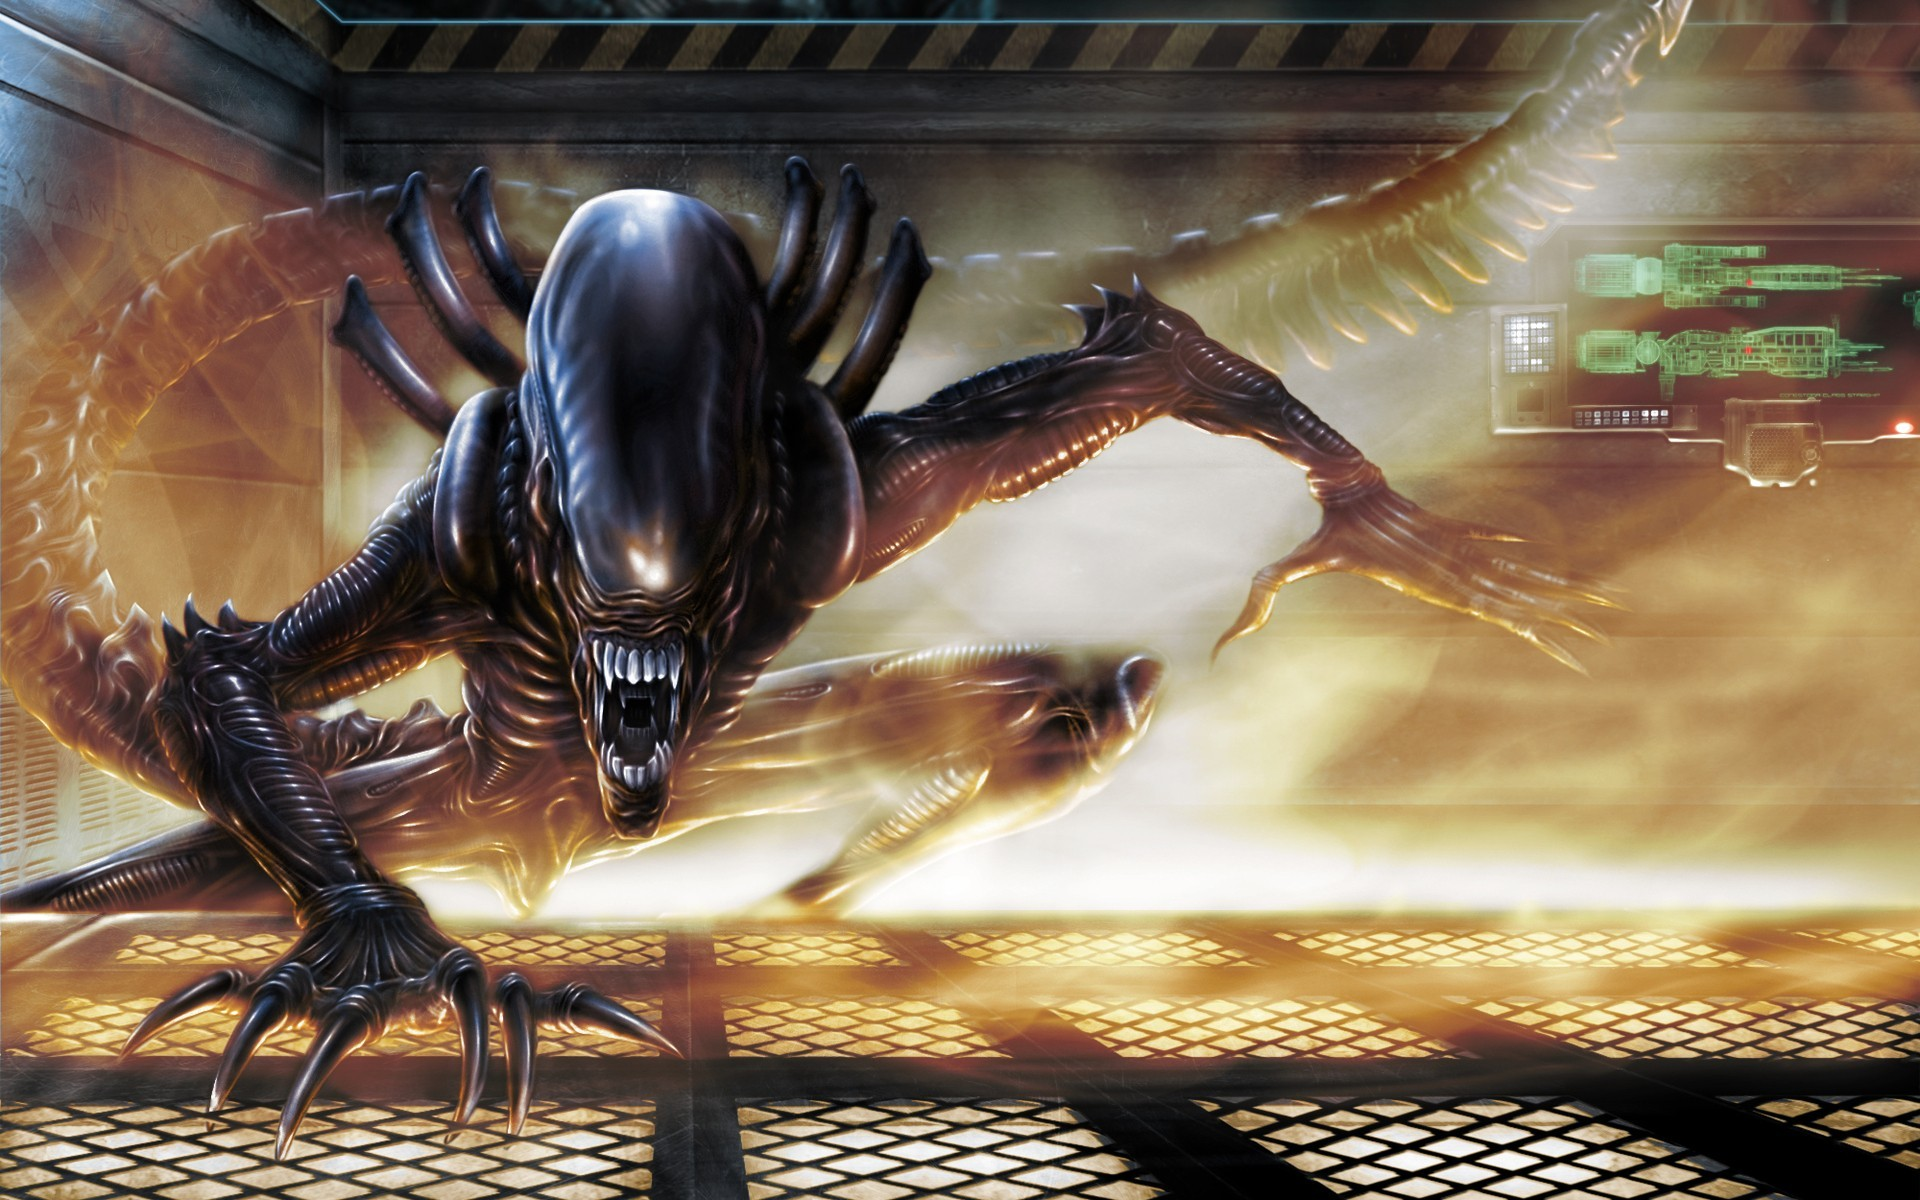 General 1920x1200 science fiction Xenomorph aliens Alien (movie) movies artwork